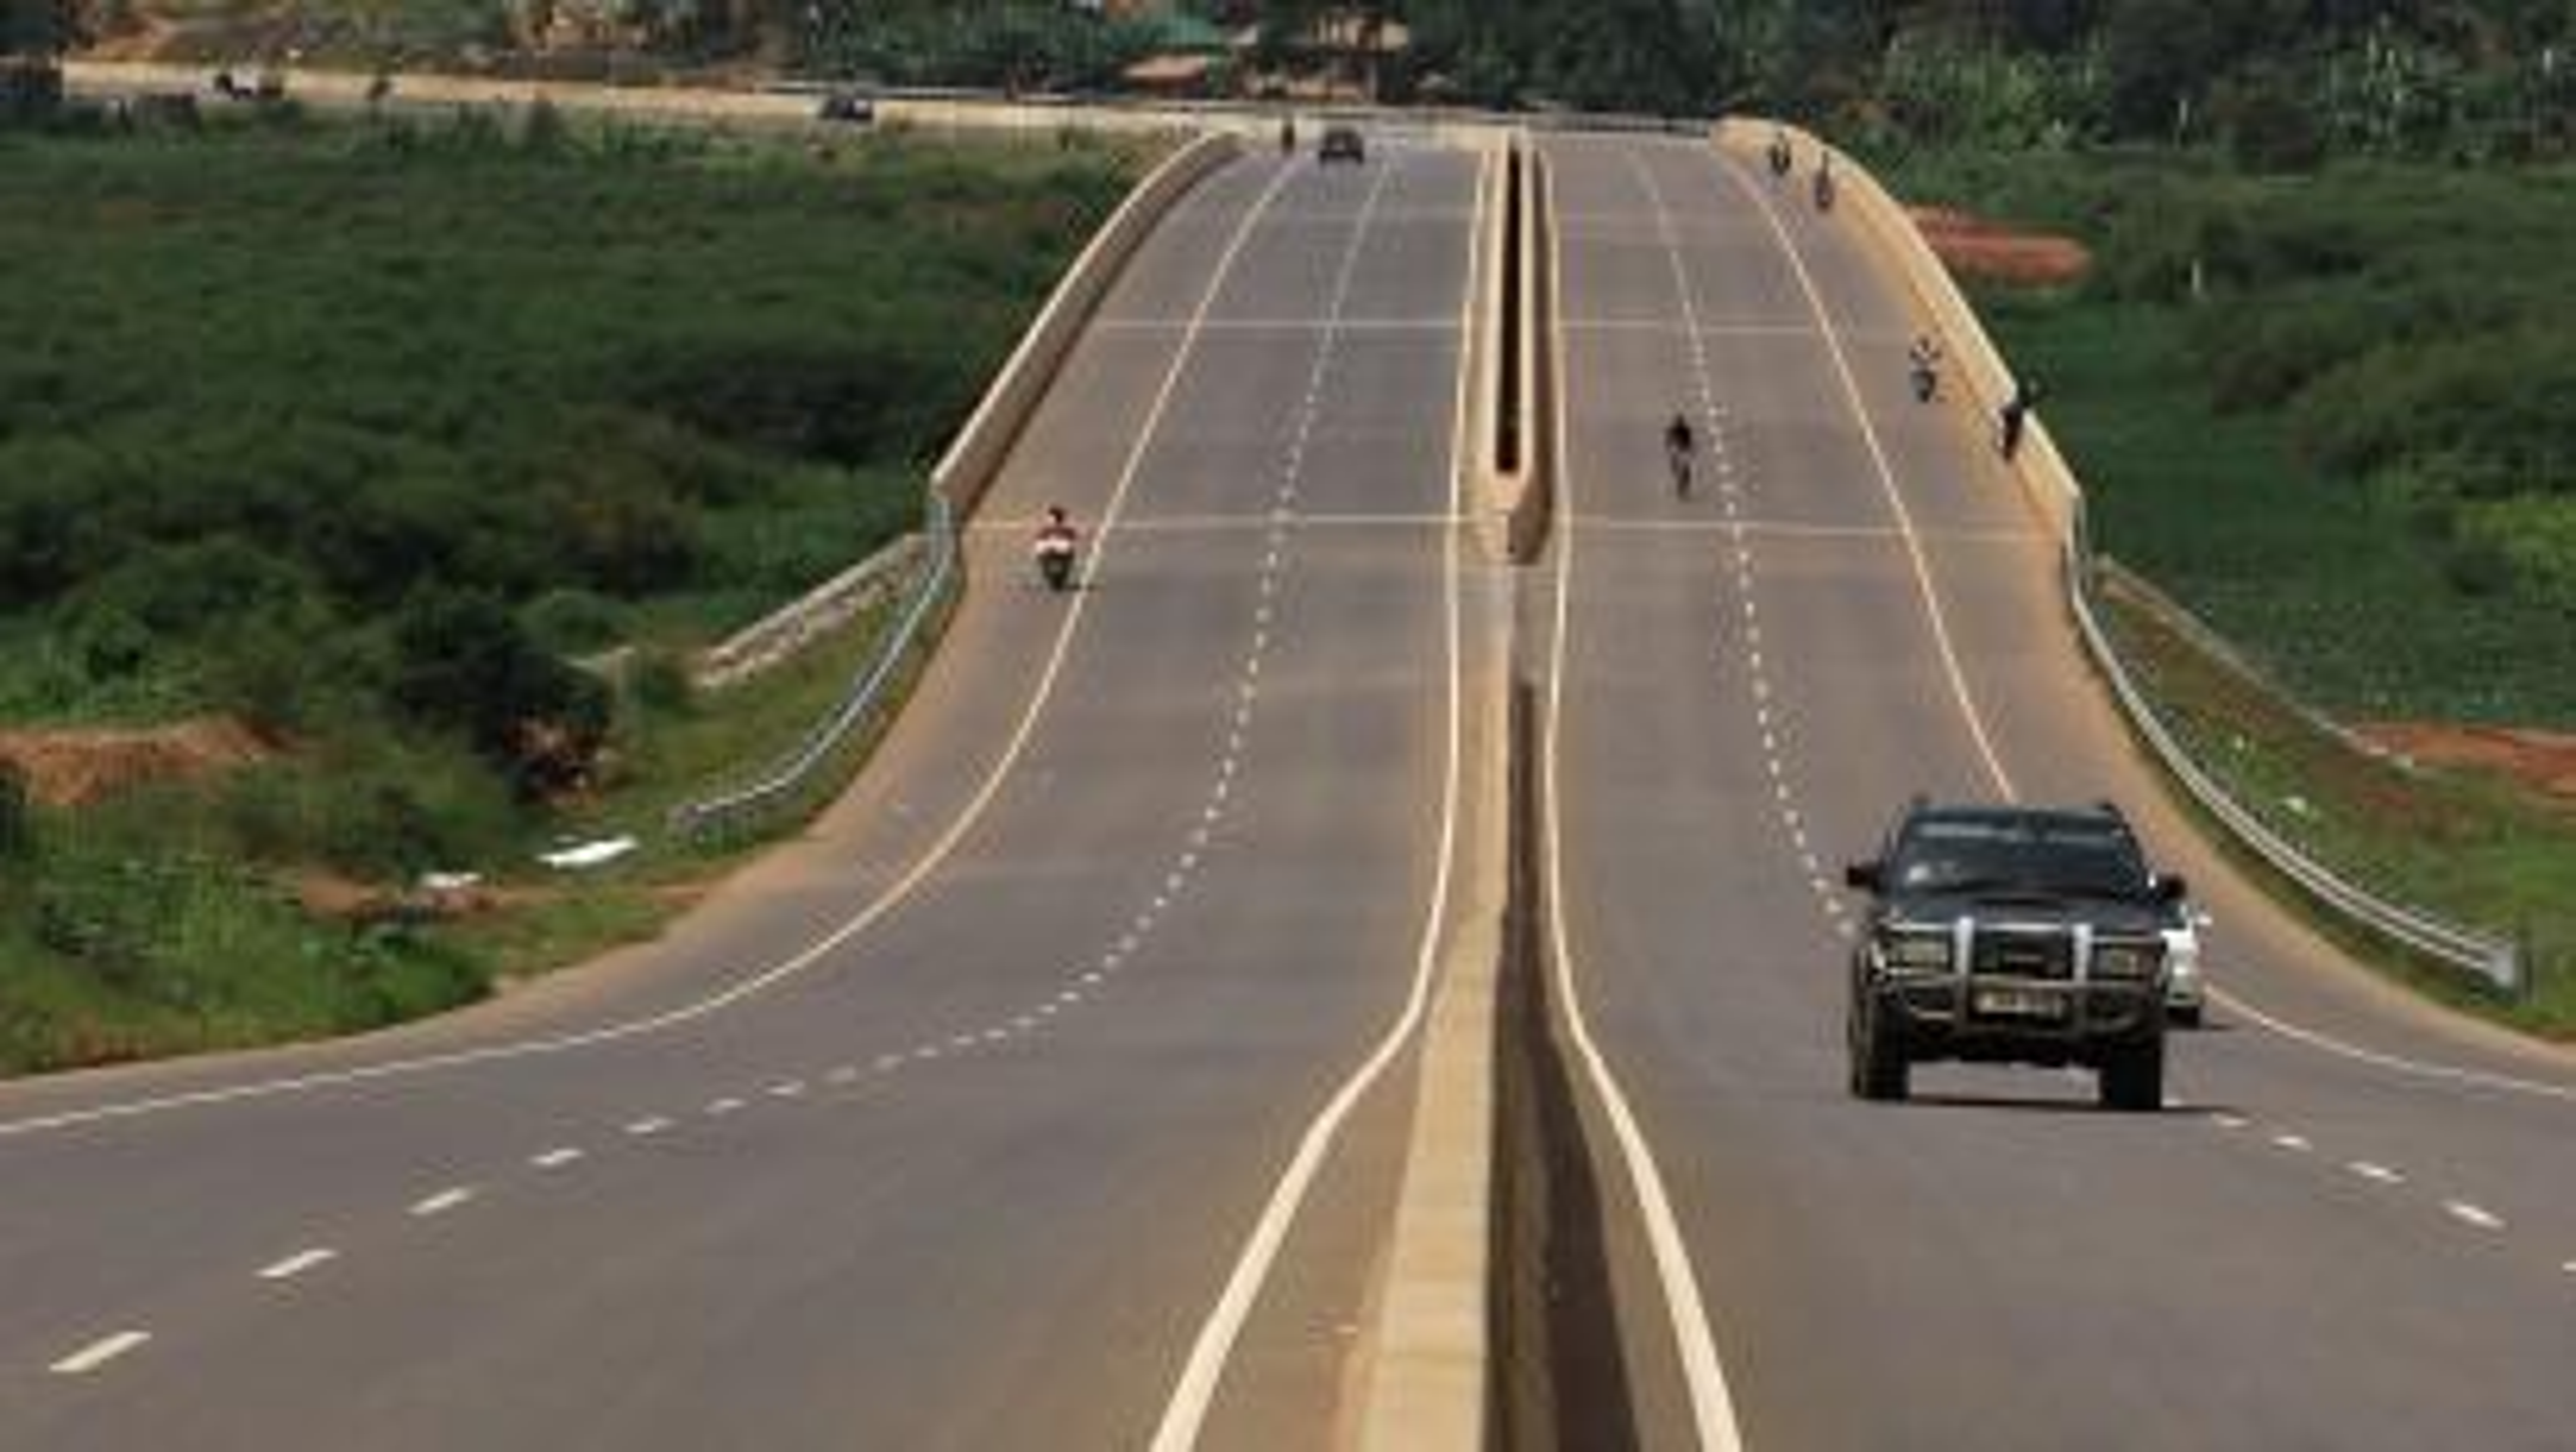 China is building expensive roads in Uganda — Quartz Africa on md road map, bc british columbia road map, kc road map, small kansas town map, mo road map, topeka road map, co road map, indiana road map, atlas road map, oklahoma road map, current road conditions kansas map, nebraska road map, kentucky road map, idaho road map, kansas city road map, km road map, wichita road map, kansas driving map, lawrence kansas road map, kansas county map,